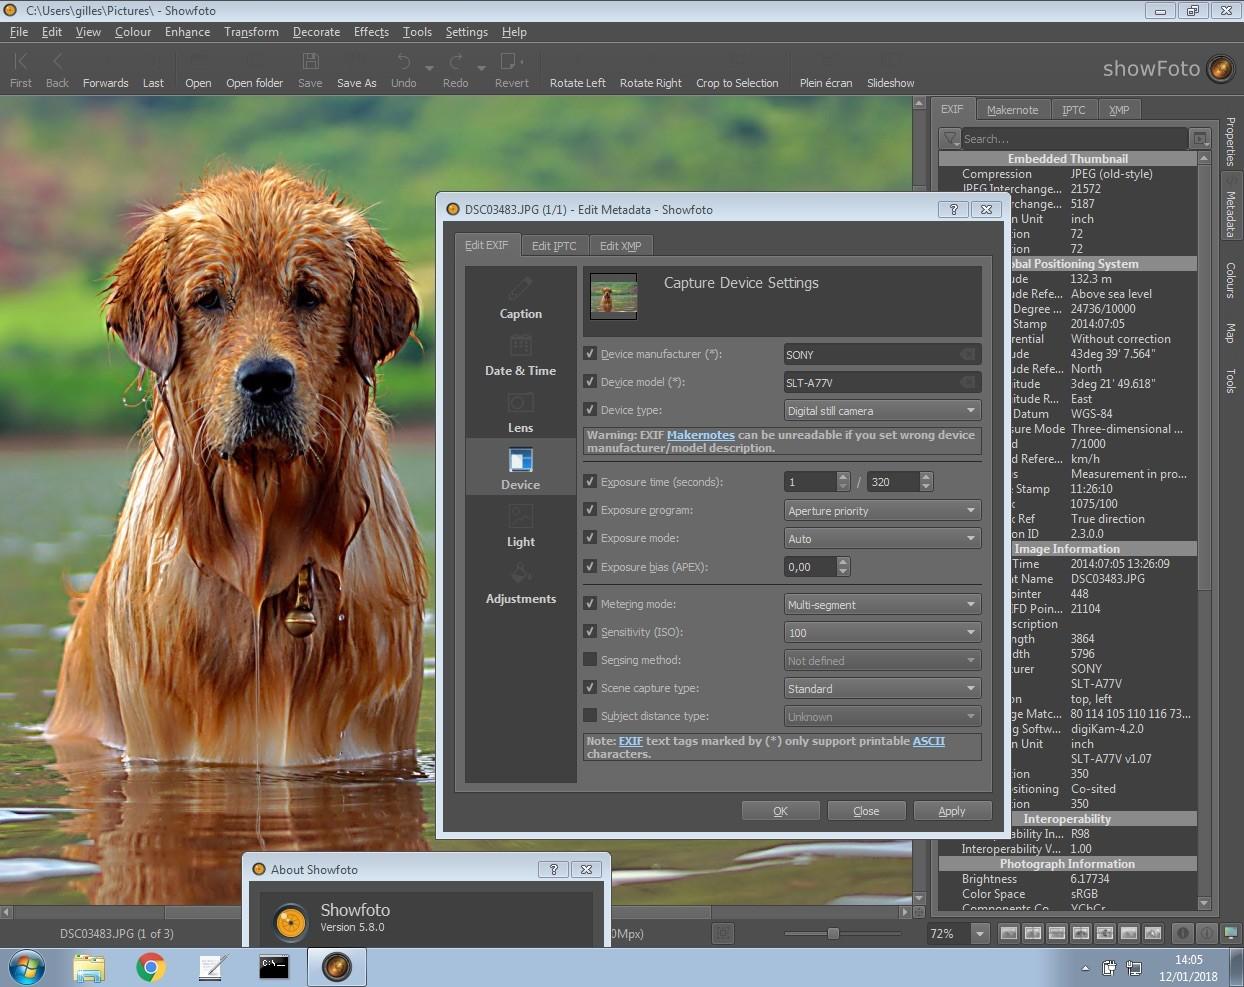 digiKam 5 8 Open-Source Image Manipulator Adds UPnP/DLNA